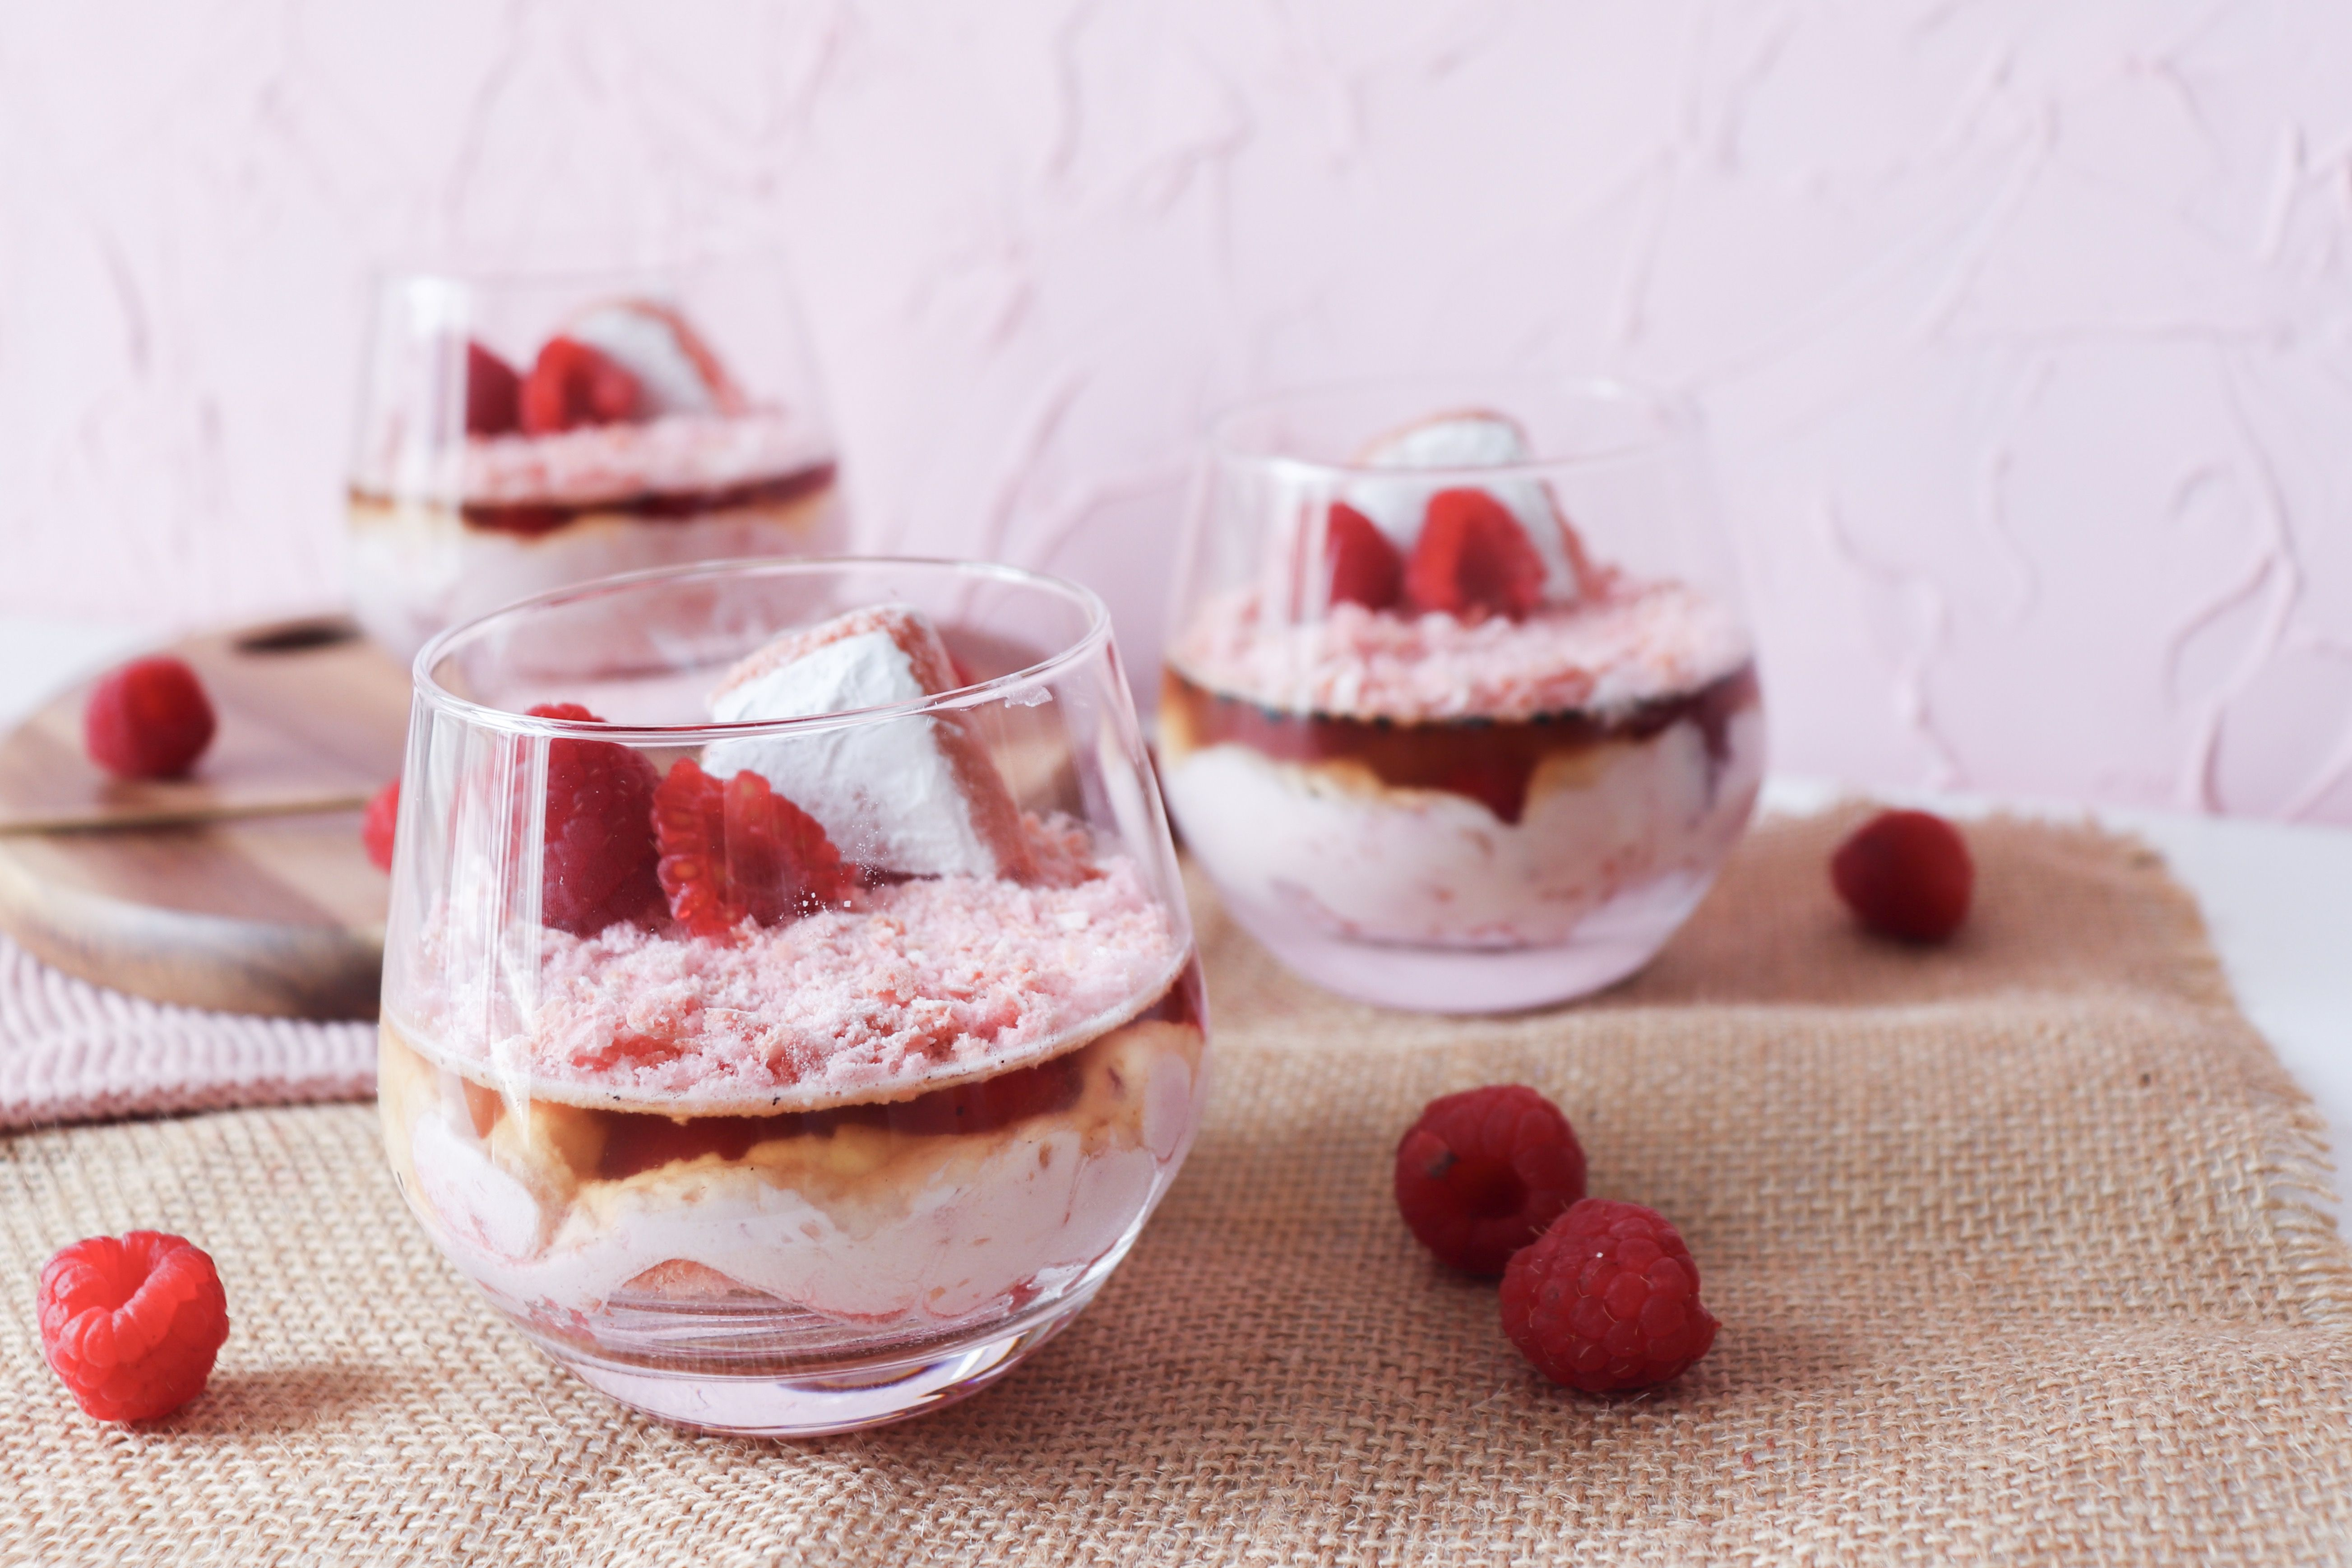 summer pink verrine framboises champagne biscuits roses recette patisserie léa patisseries inspirées